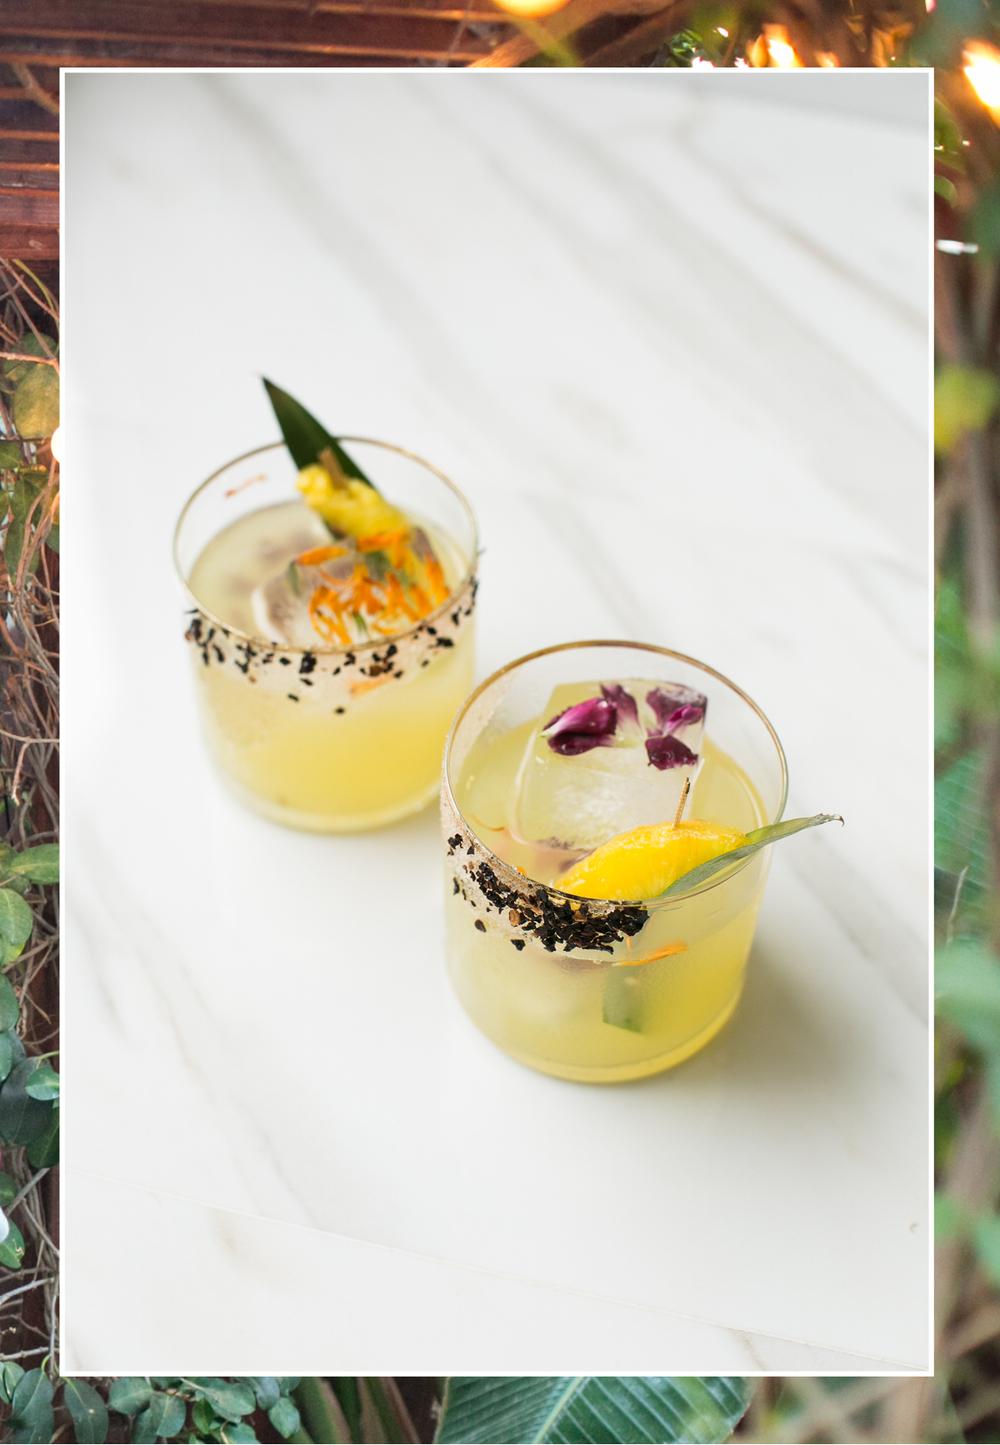 Spicy Pineapple Mezcal Margarita